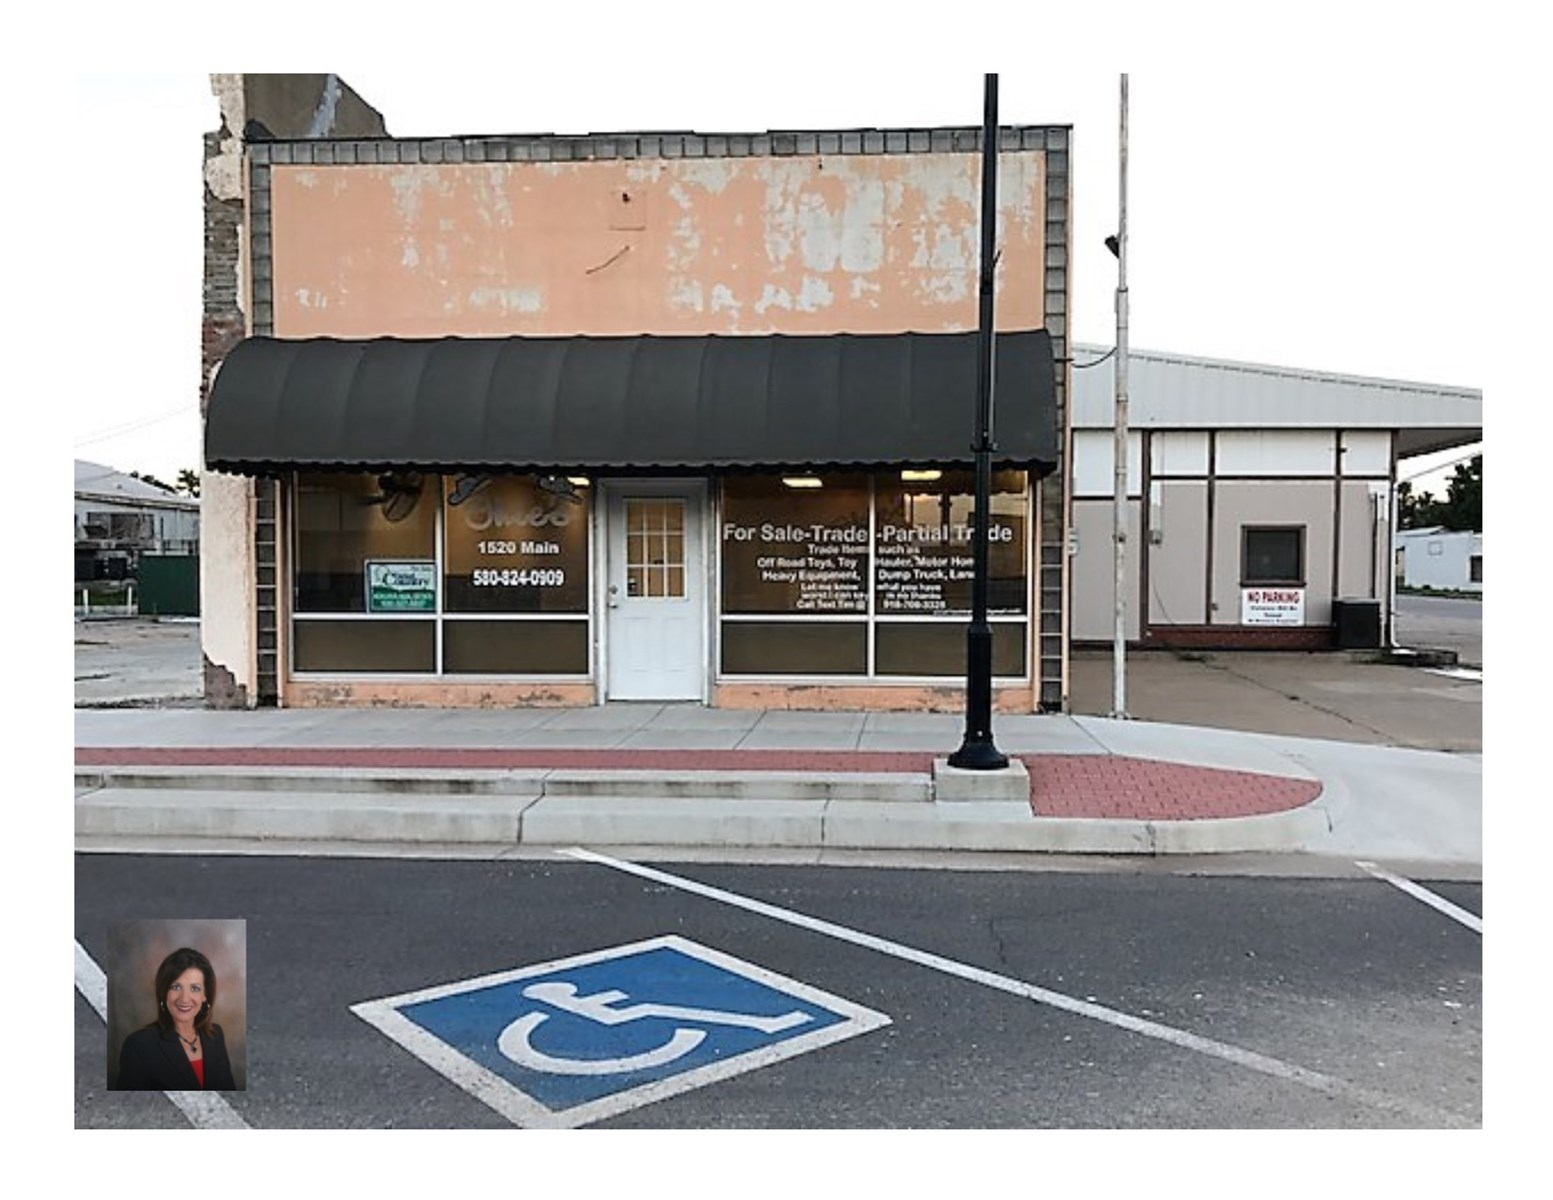 Commercial Building For Sale Waynoka, OK